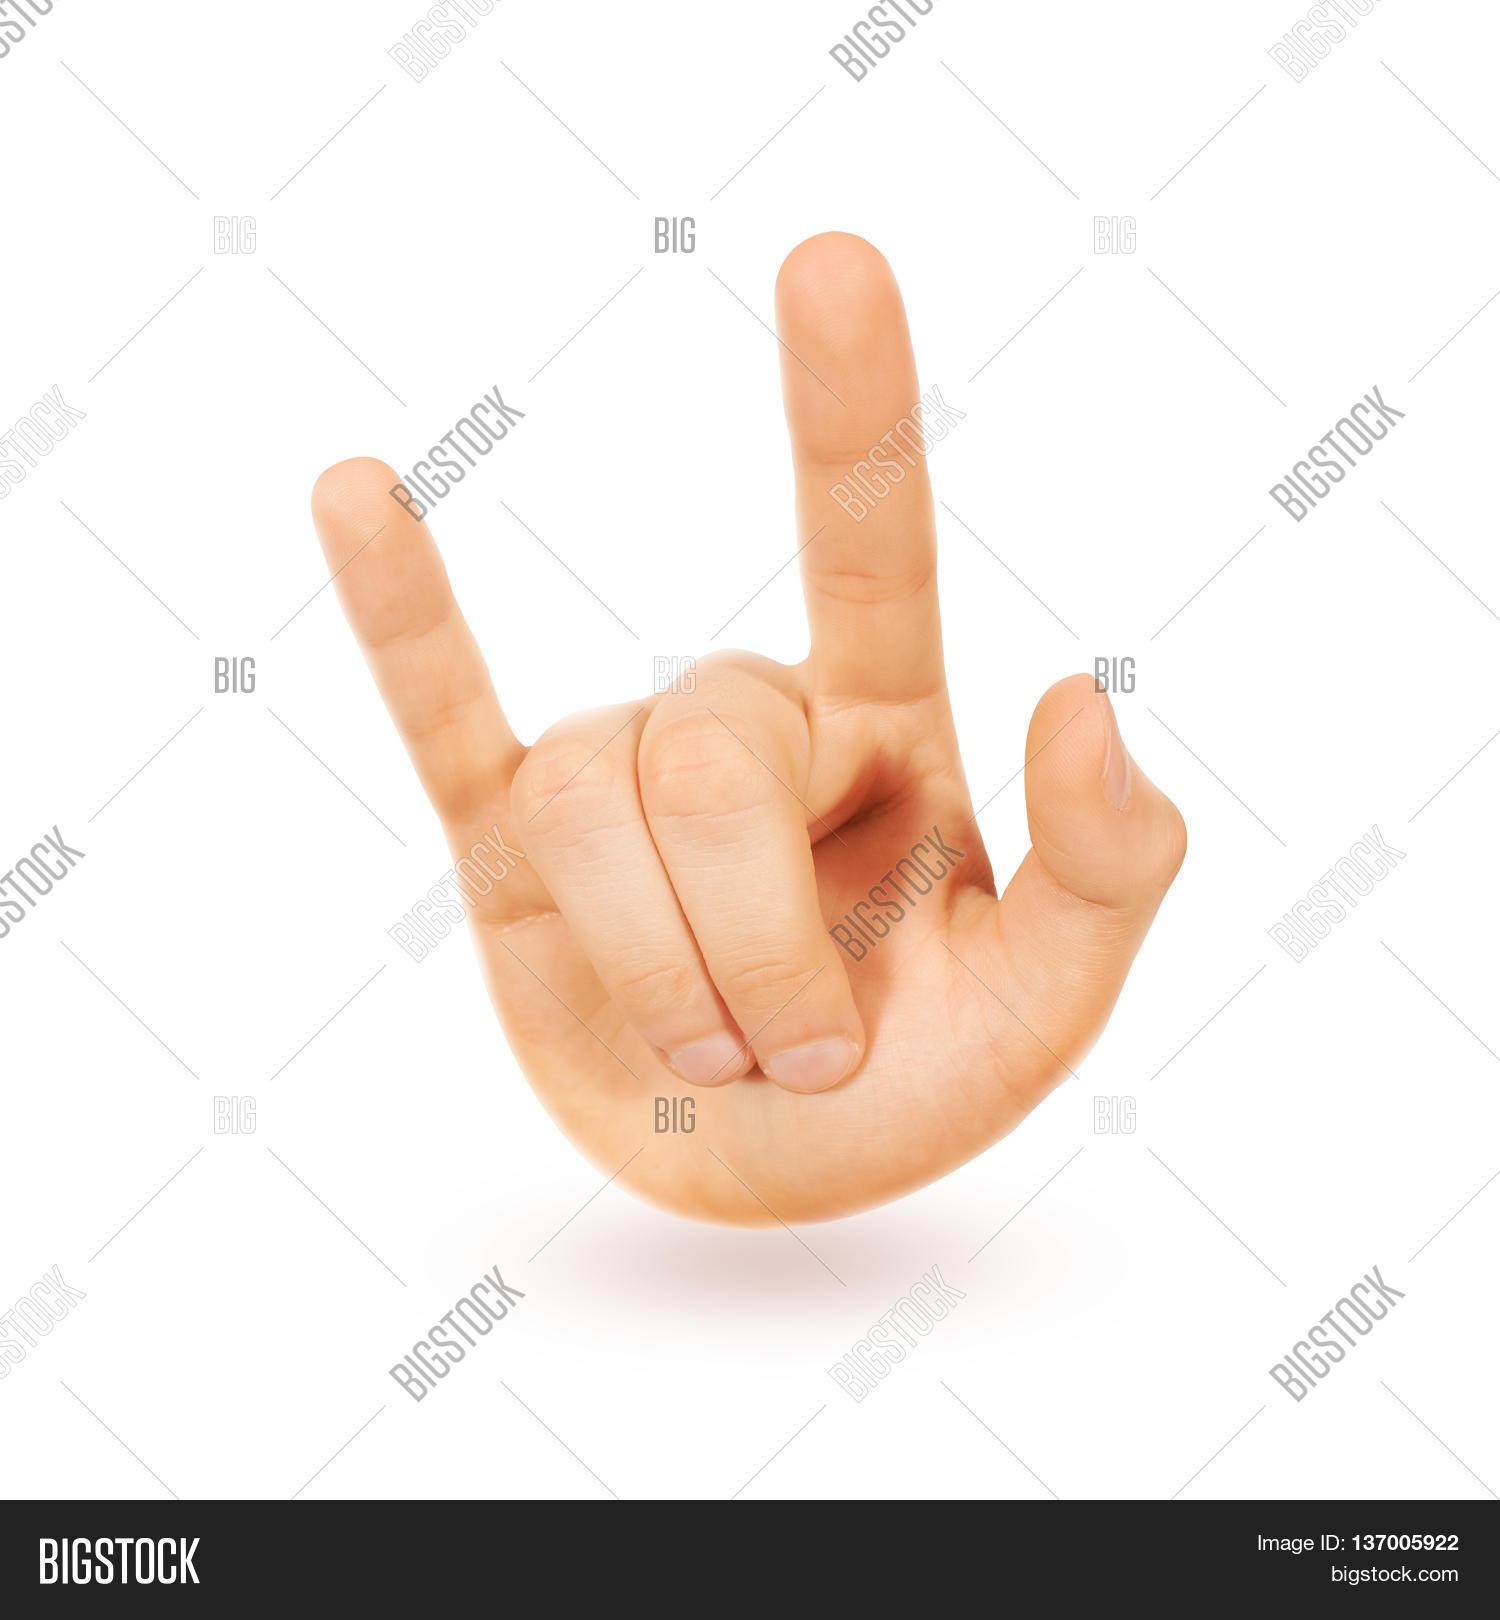 Rock n roll heavy metal sign hand image photo bigstock rock n roll heavy metal sign hand isolated music love symbol icon buycottarizona